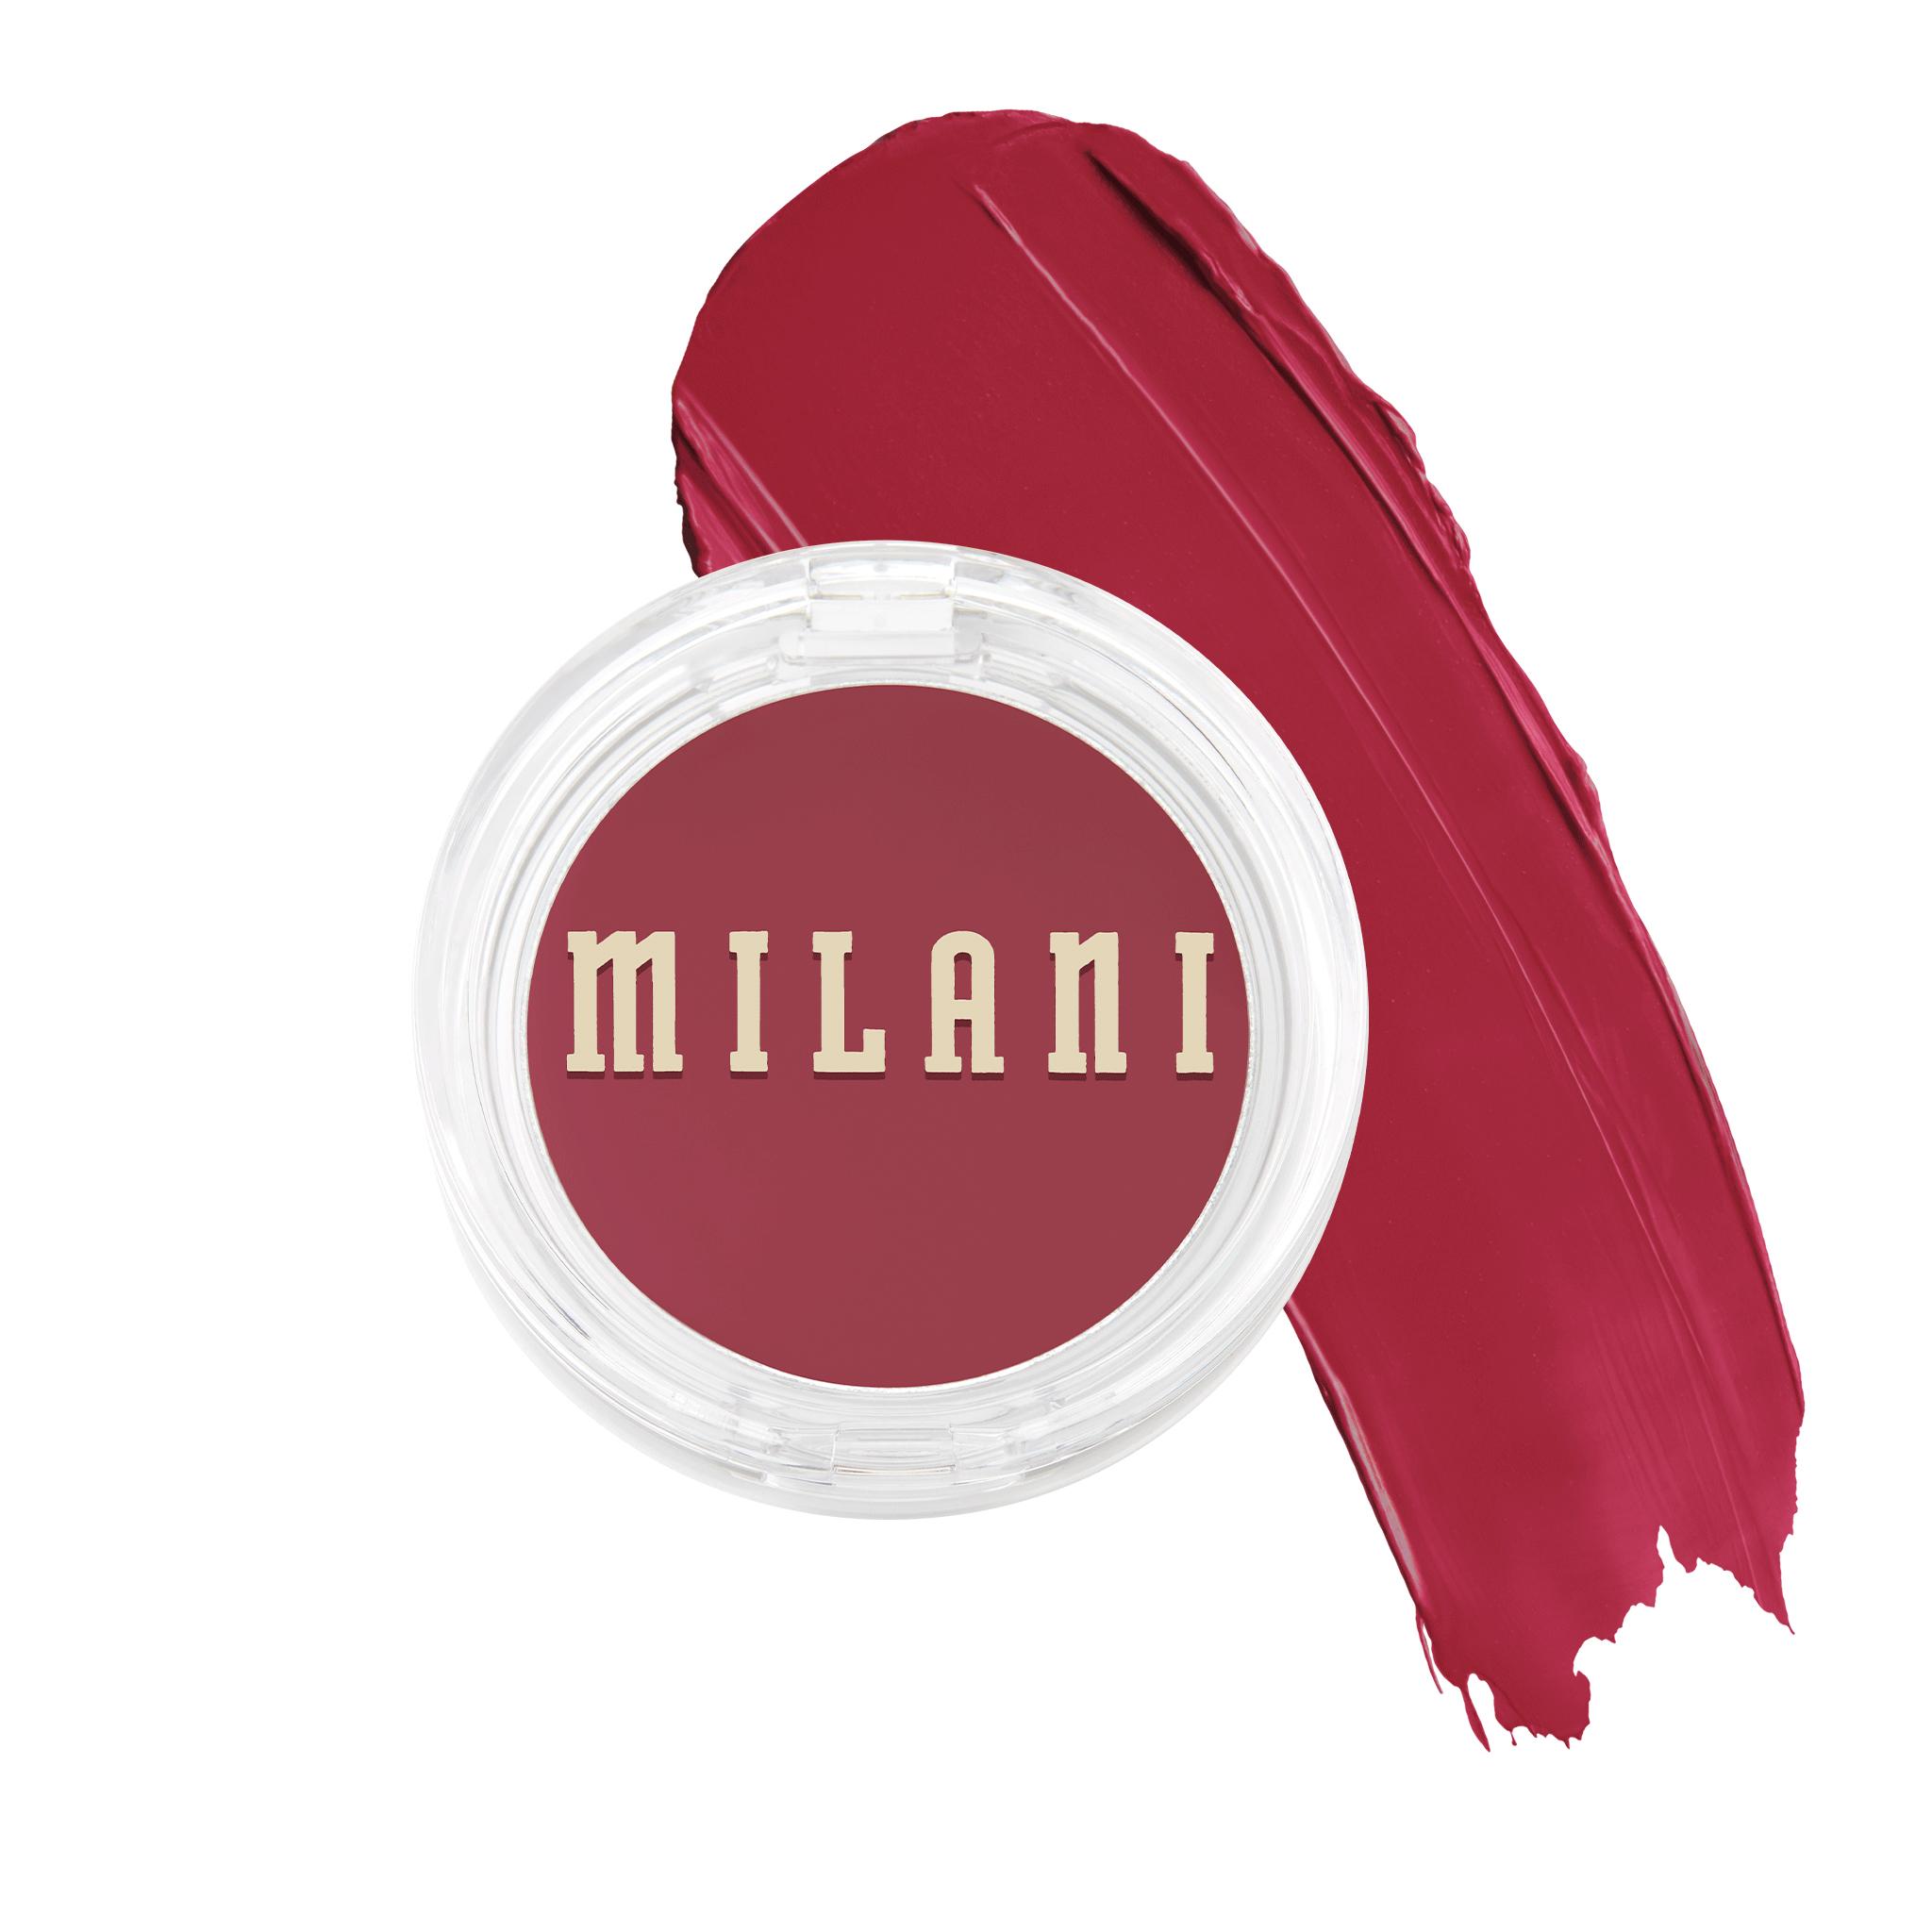 MILANI_Cheek Kiss Cream Blush kremowy róż do policzków Merlot Moment